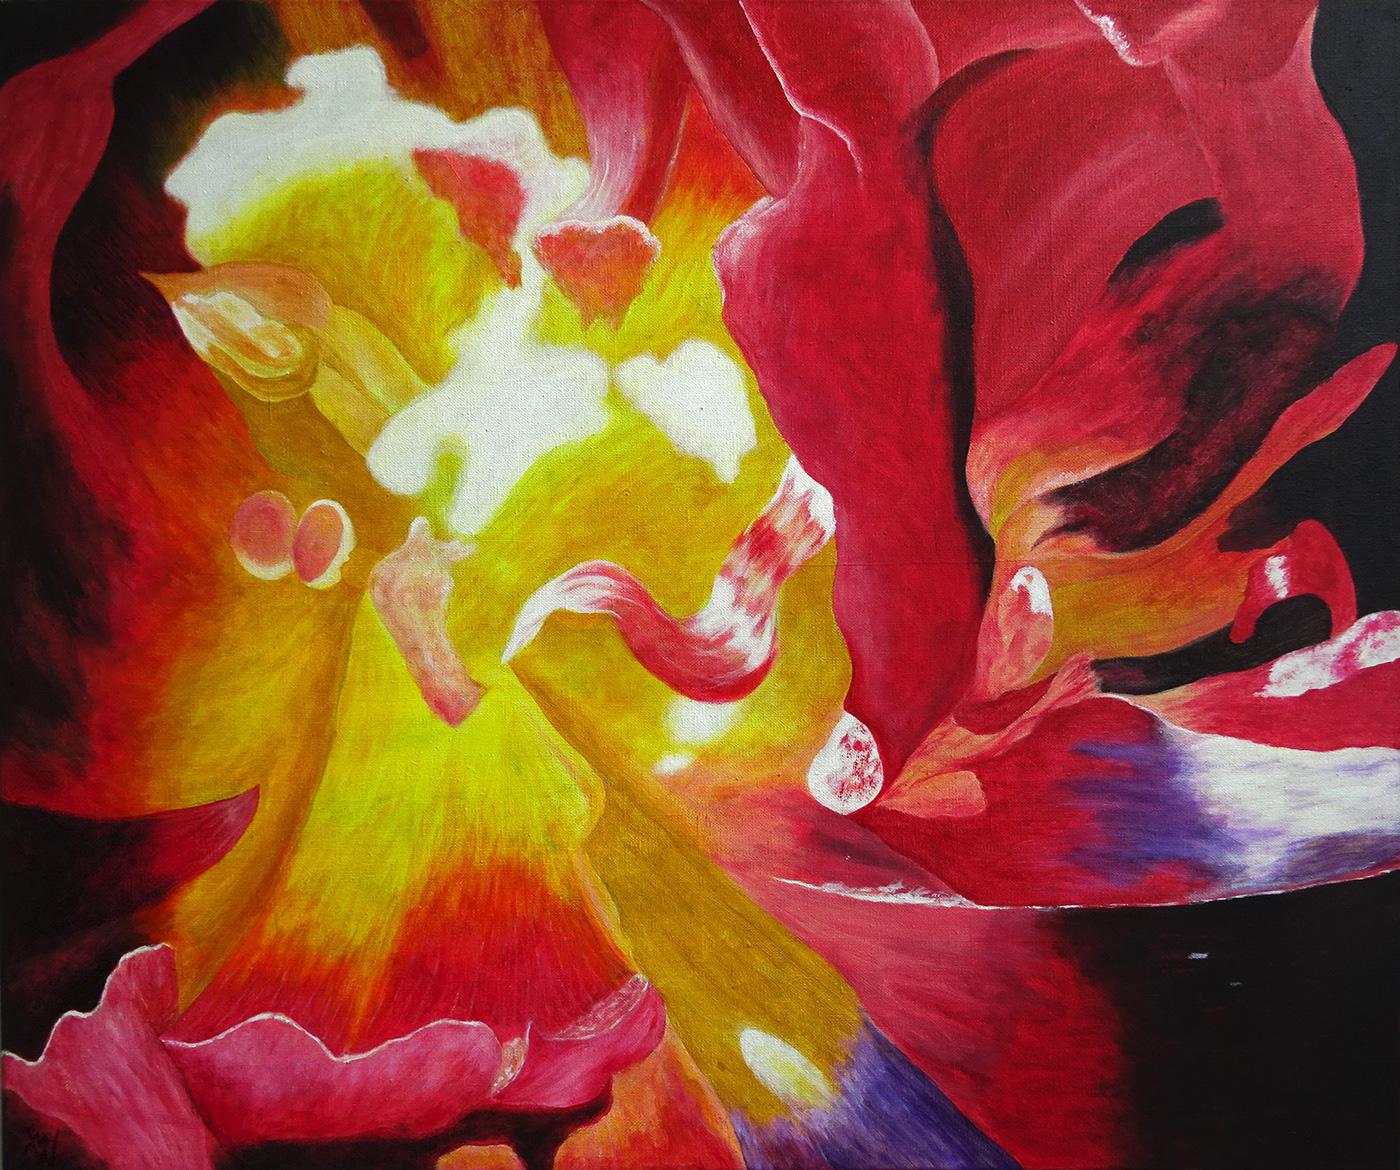 acrylic painting Flowers flower art flower paintings mike wasser michael wasser wasser